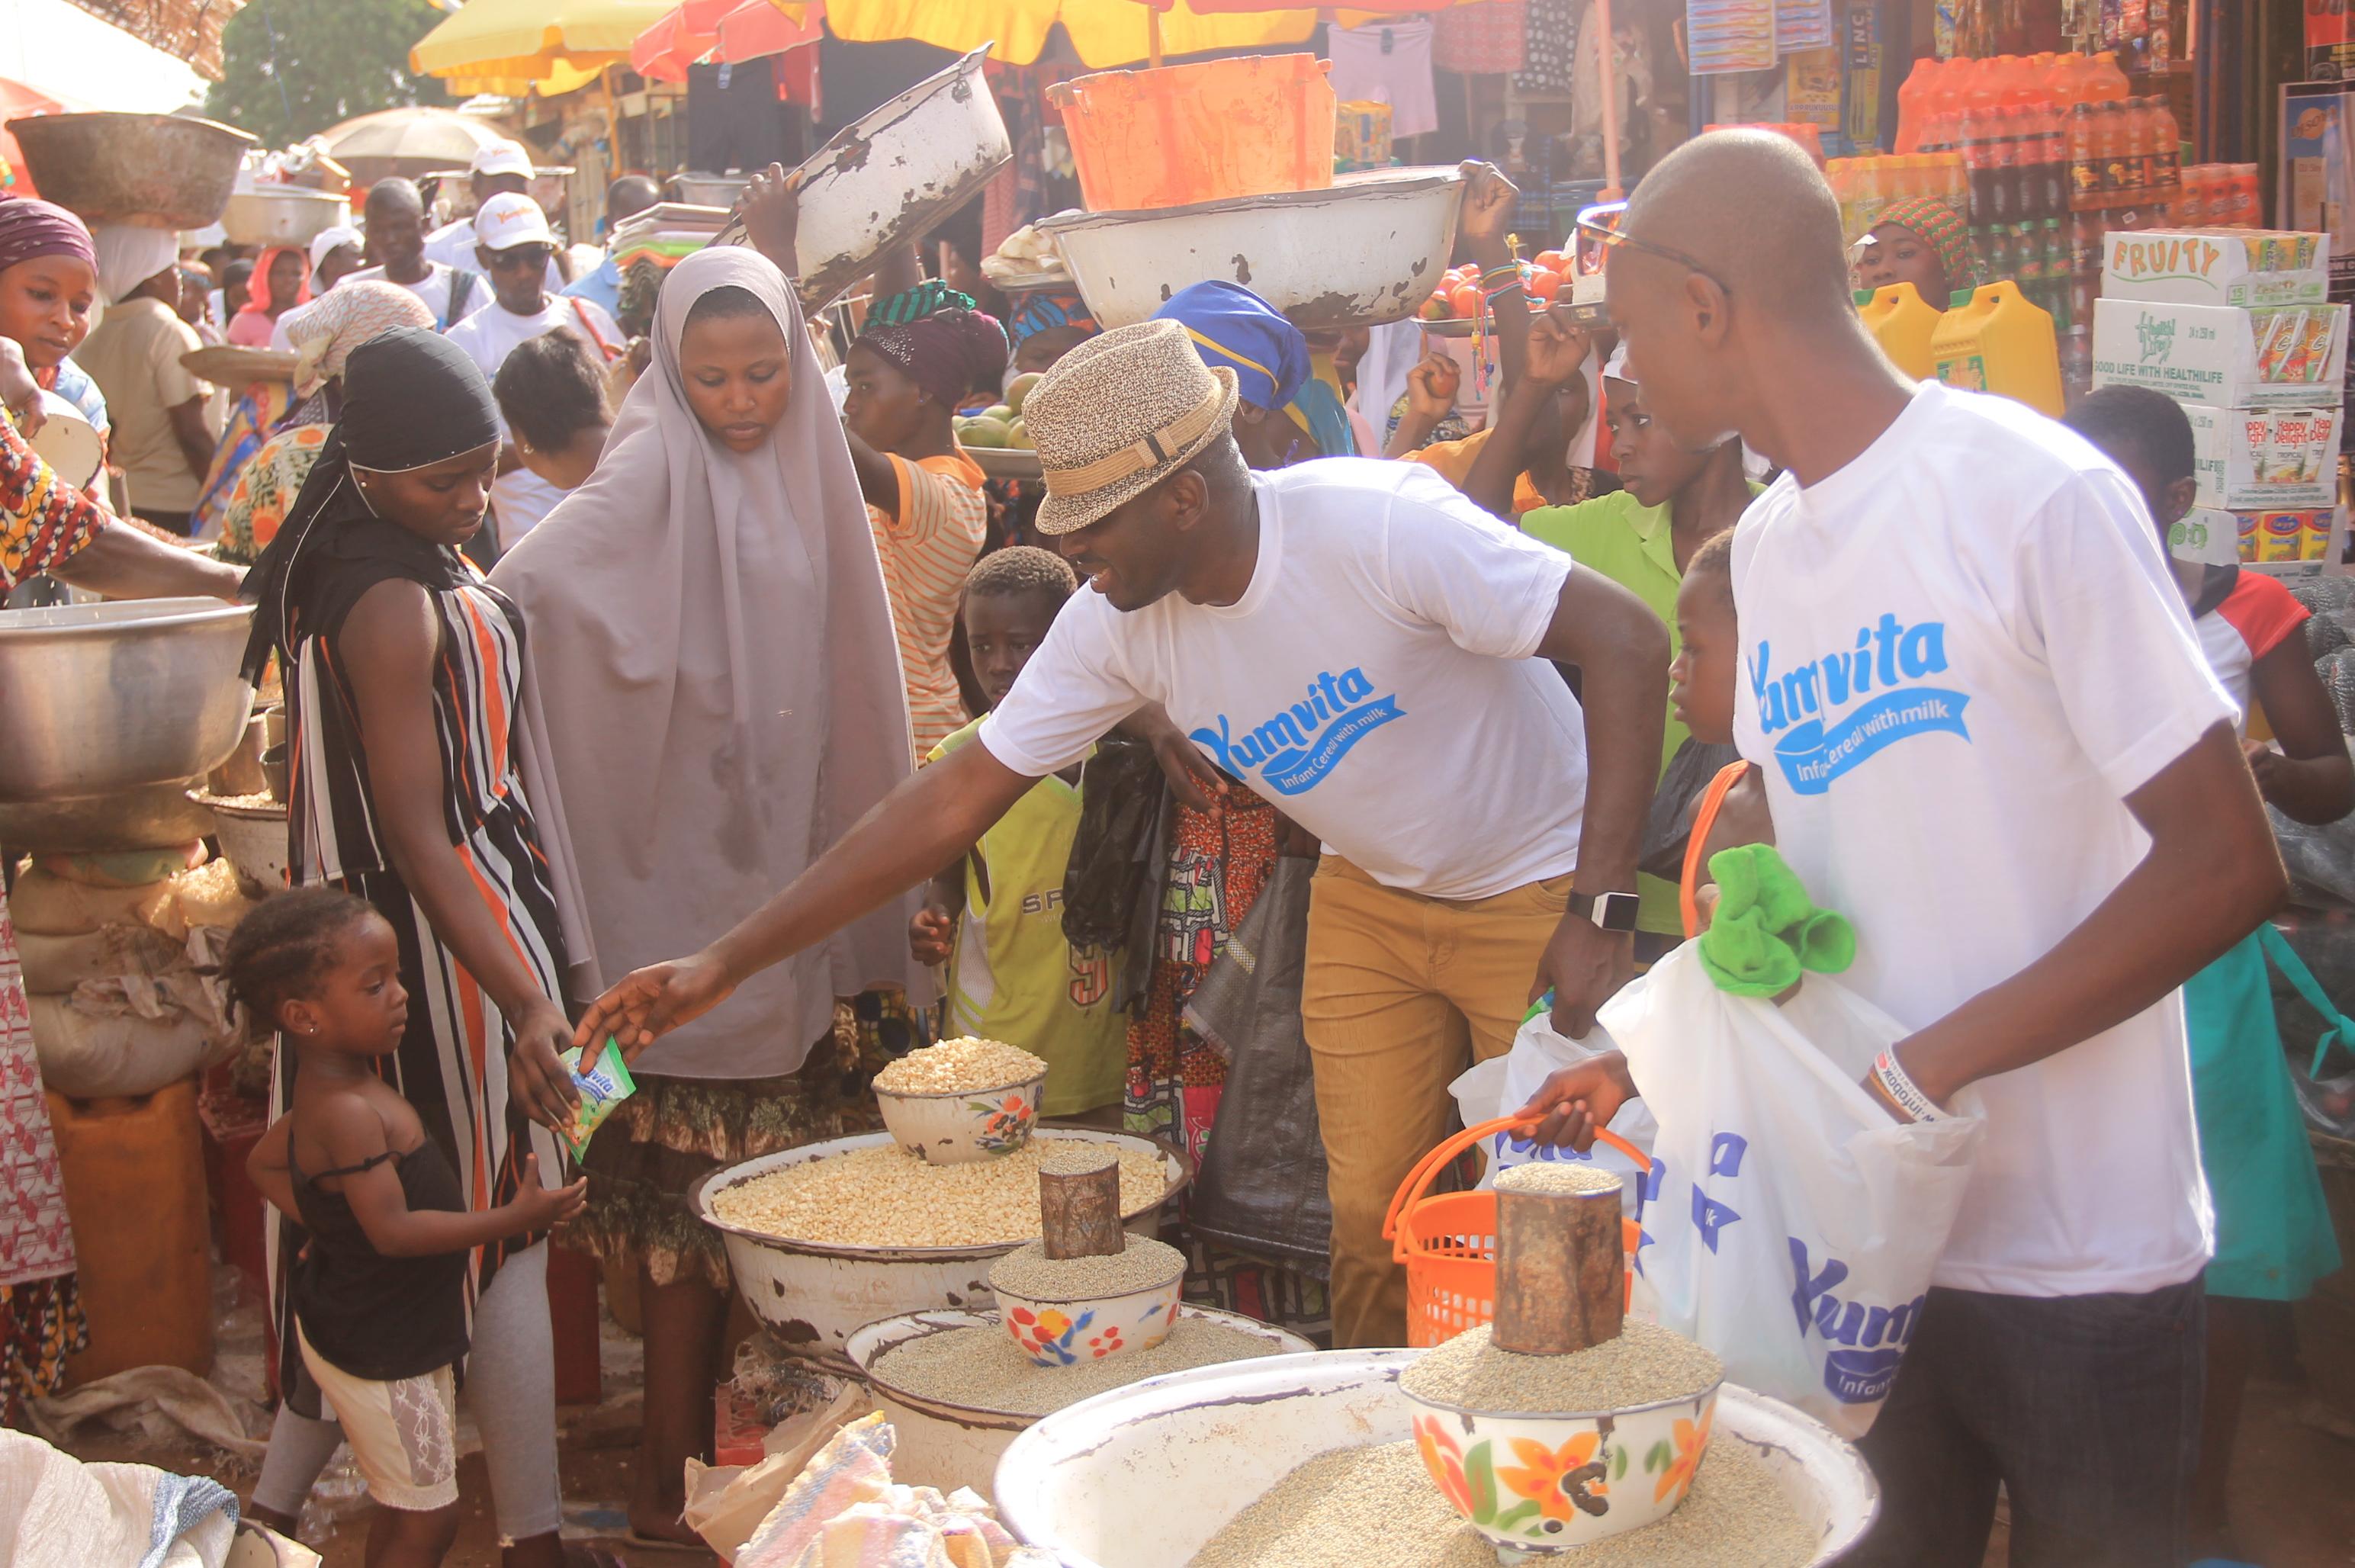 Yumvita goes from strength to strength in Ghana